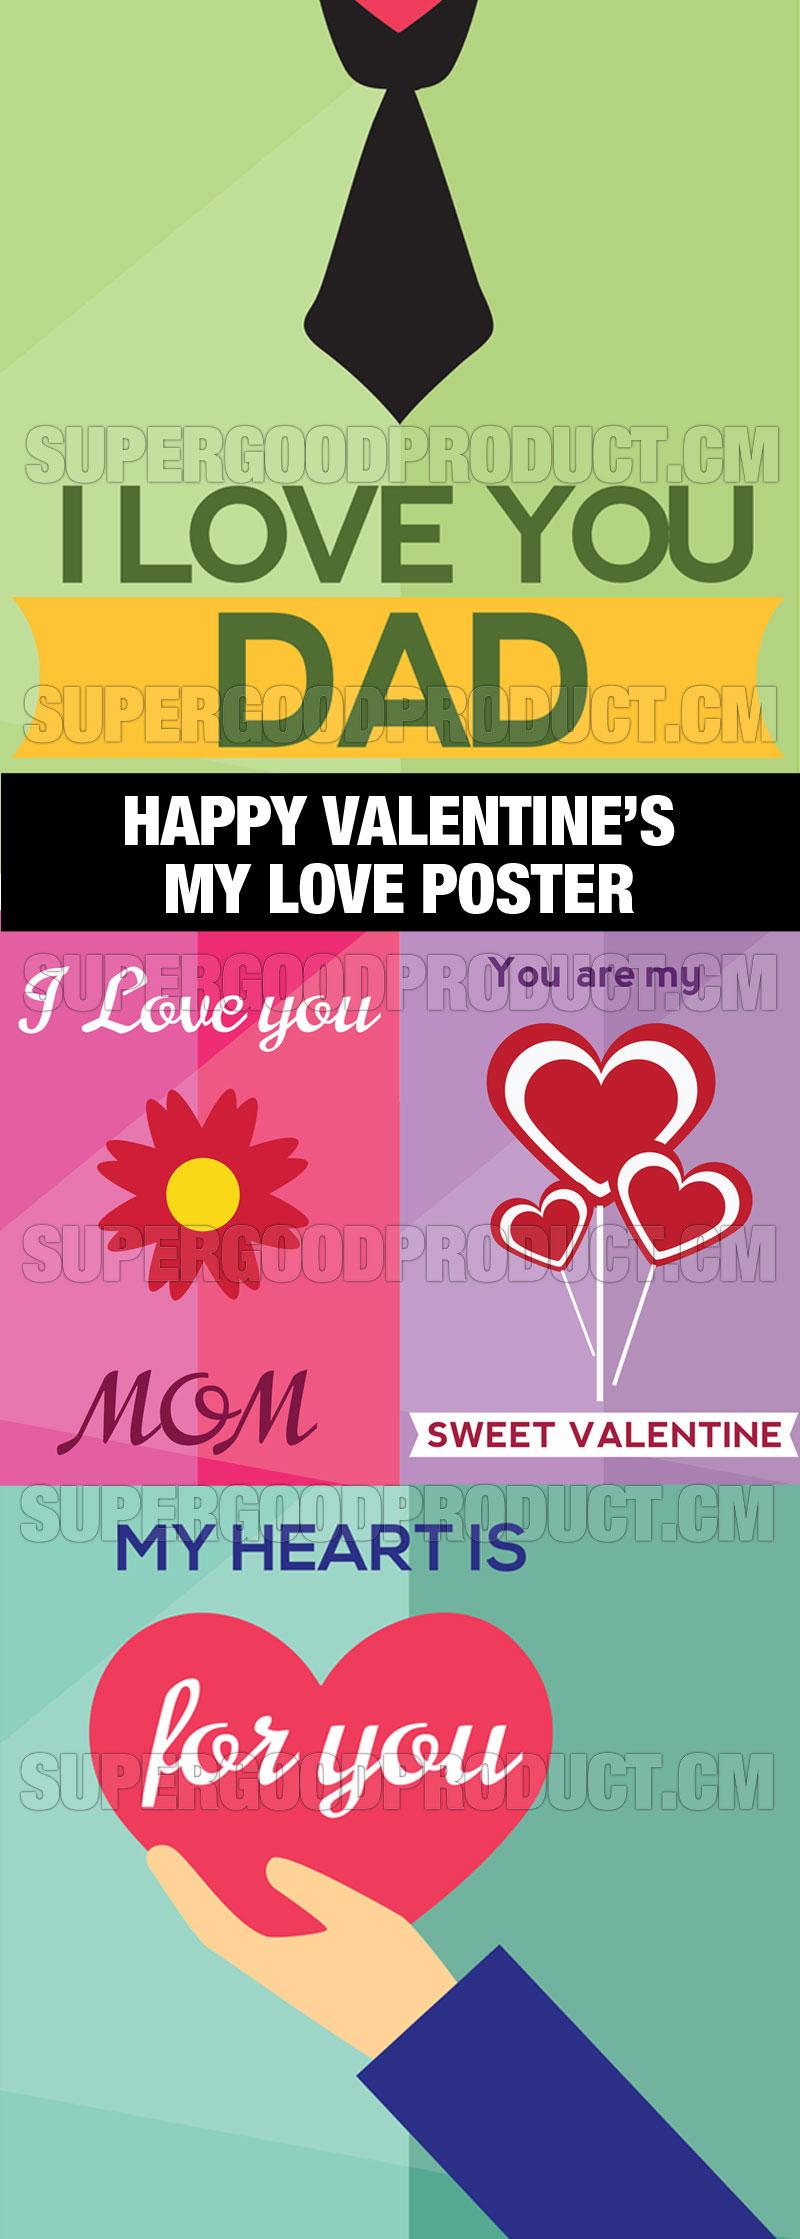 Happy-Valentines-Day-My-Love-Poster